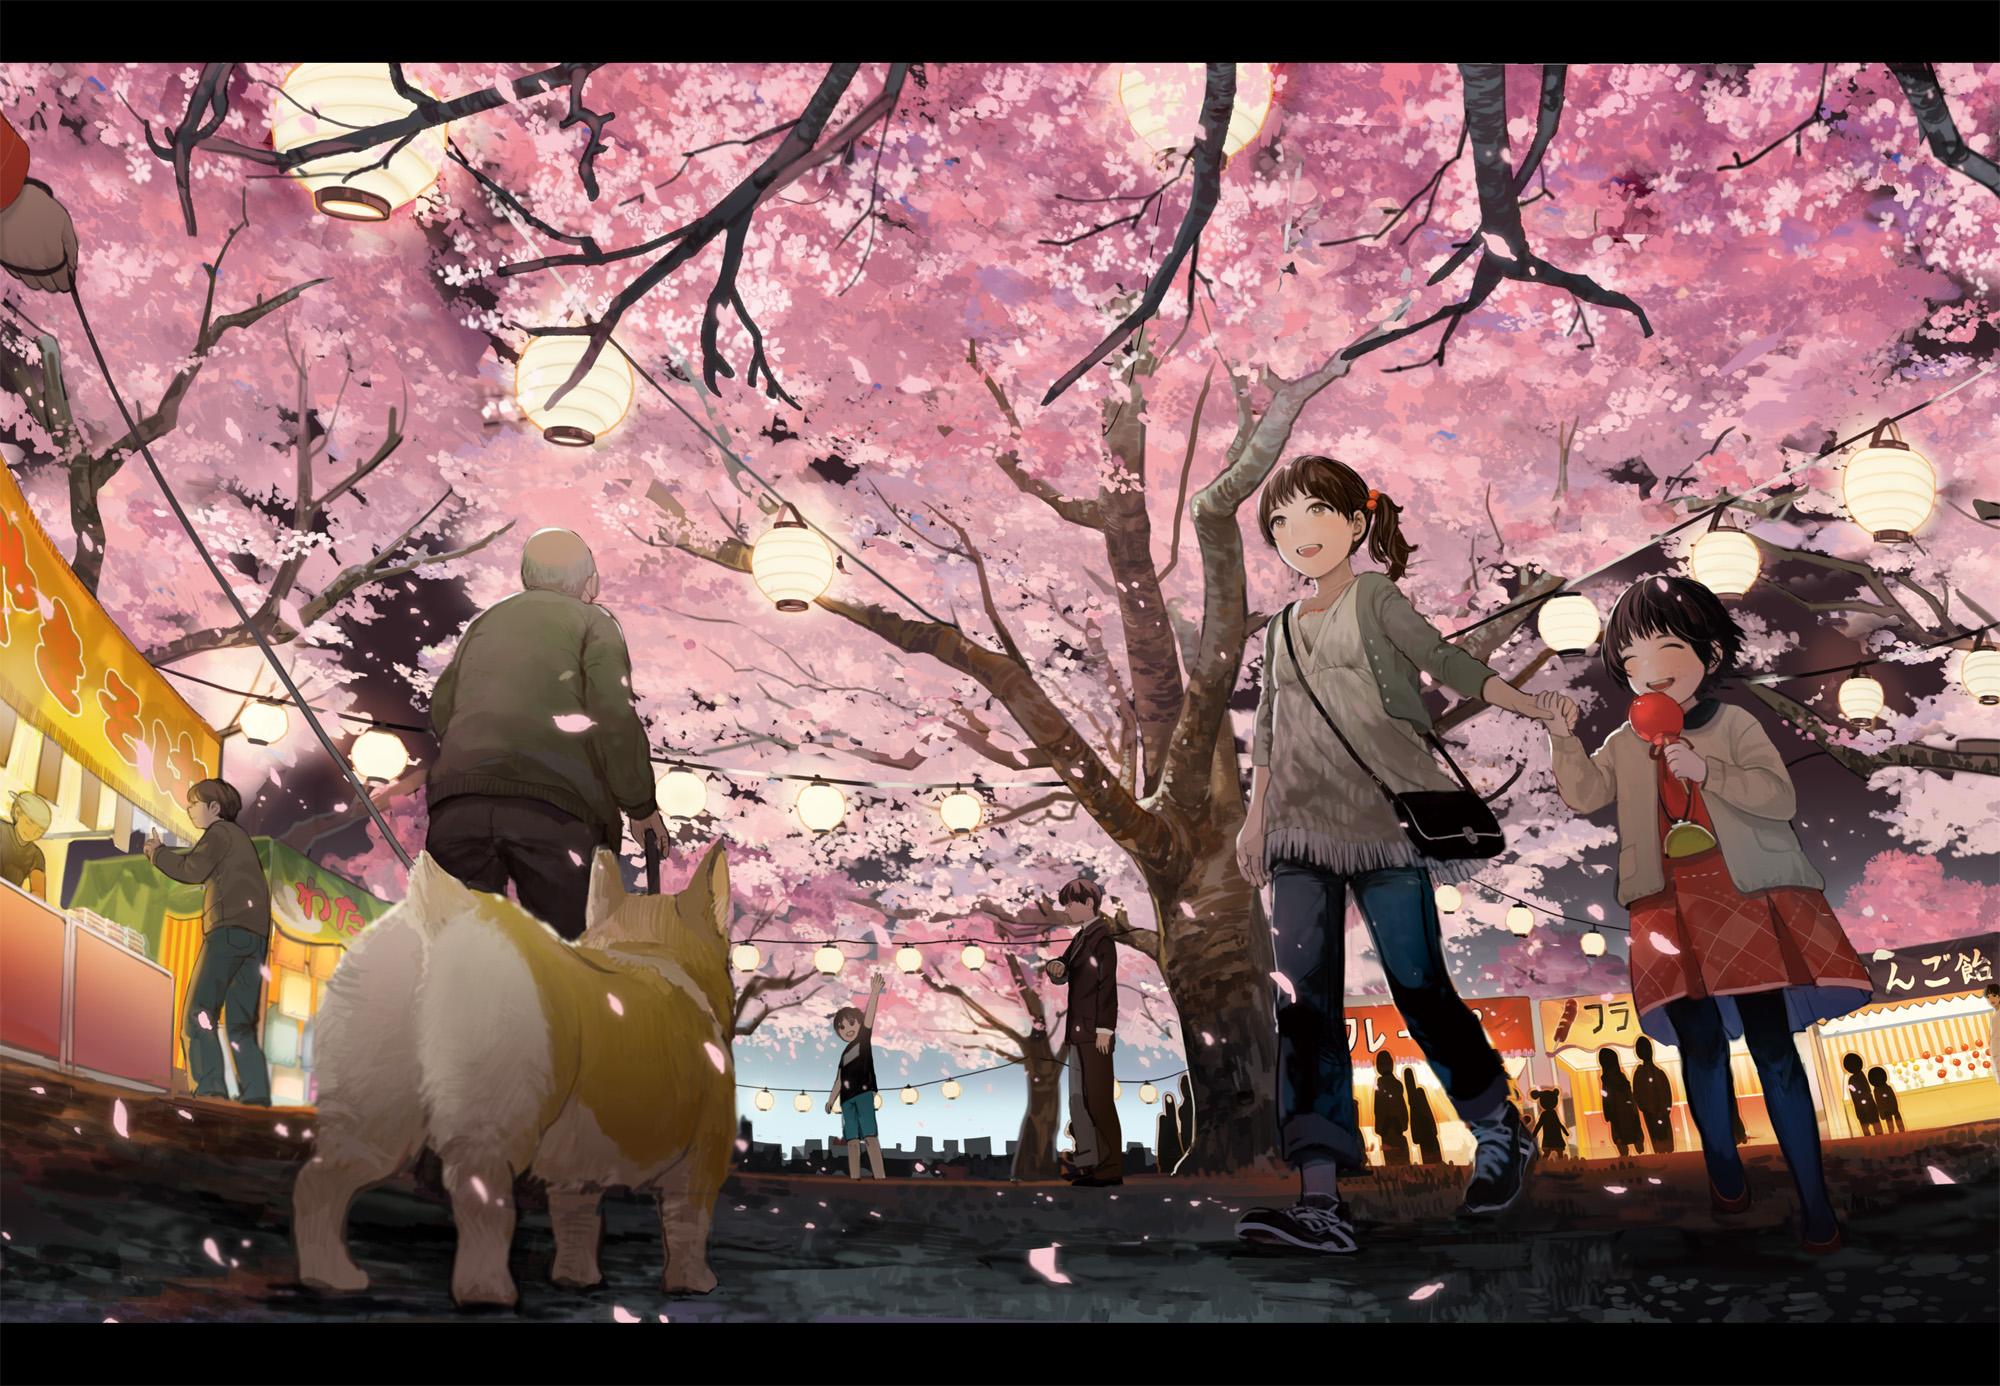 Tags Anime Shimetta Oshime Festival Spring Original Pixiv